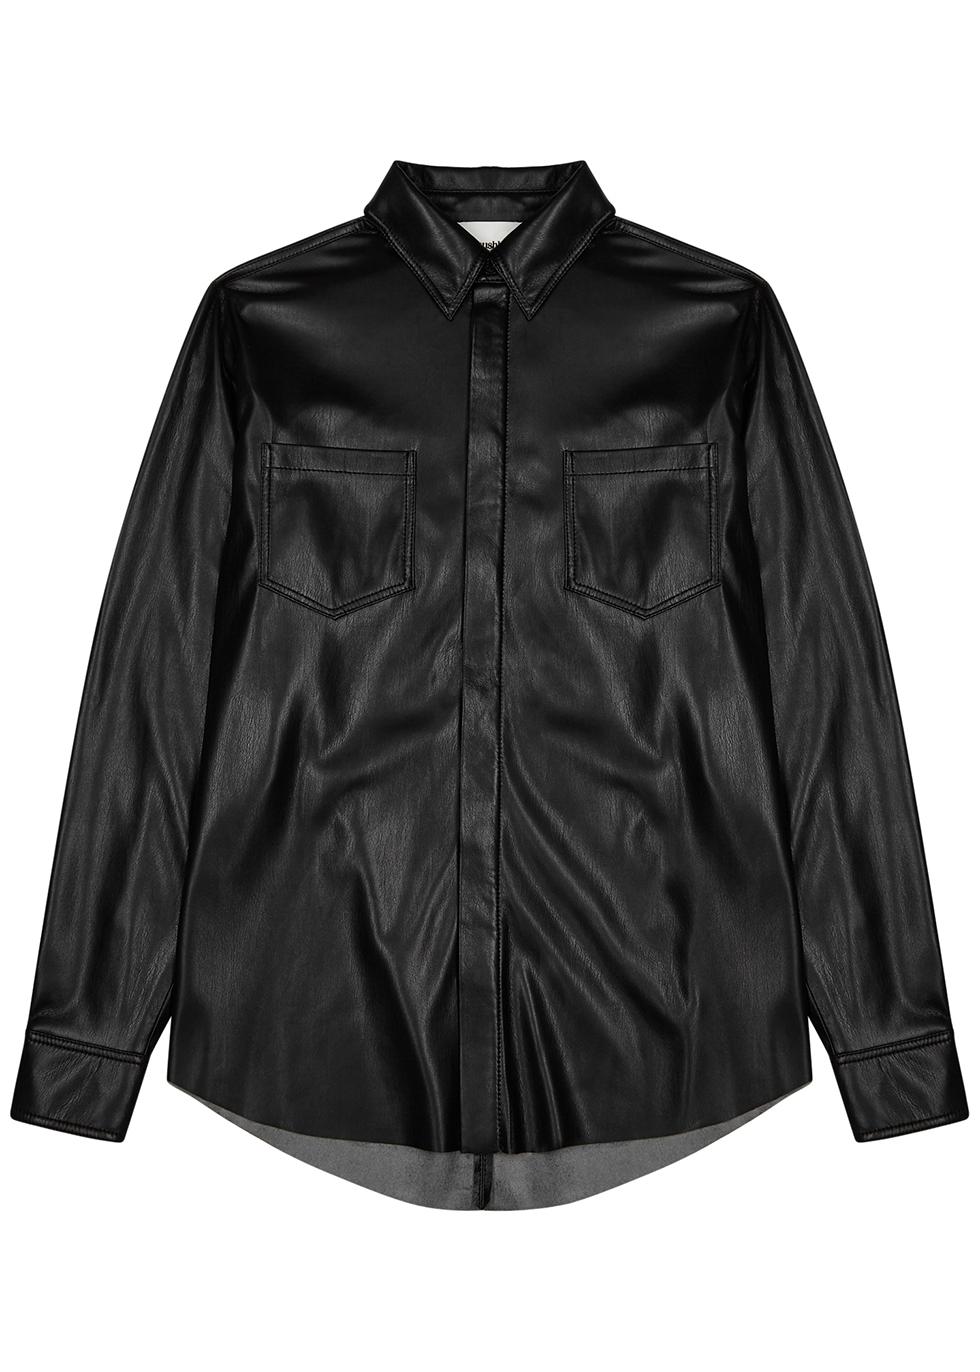 Declan black faux leather shirt